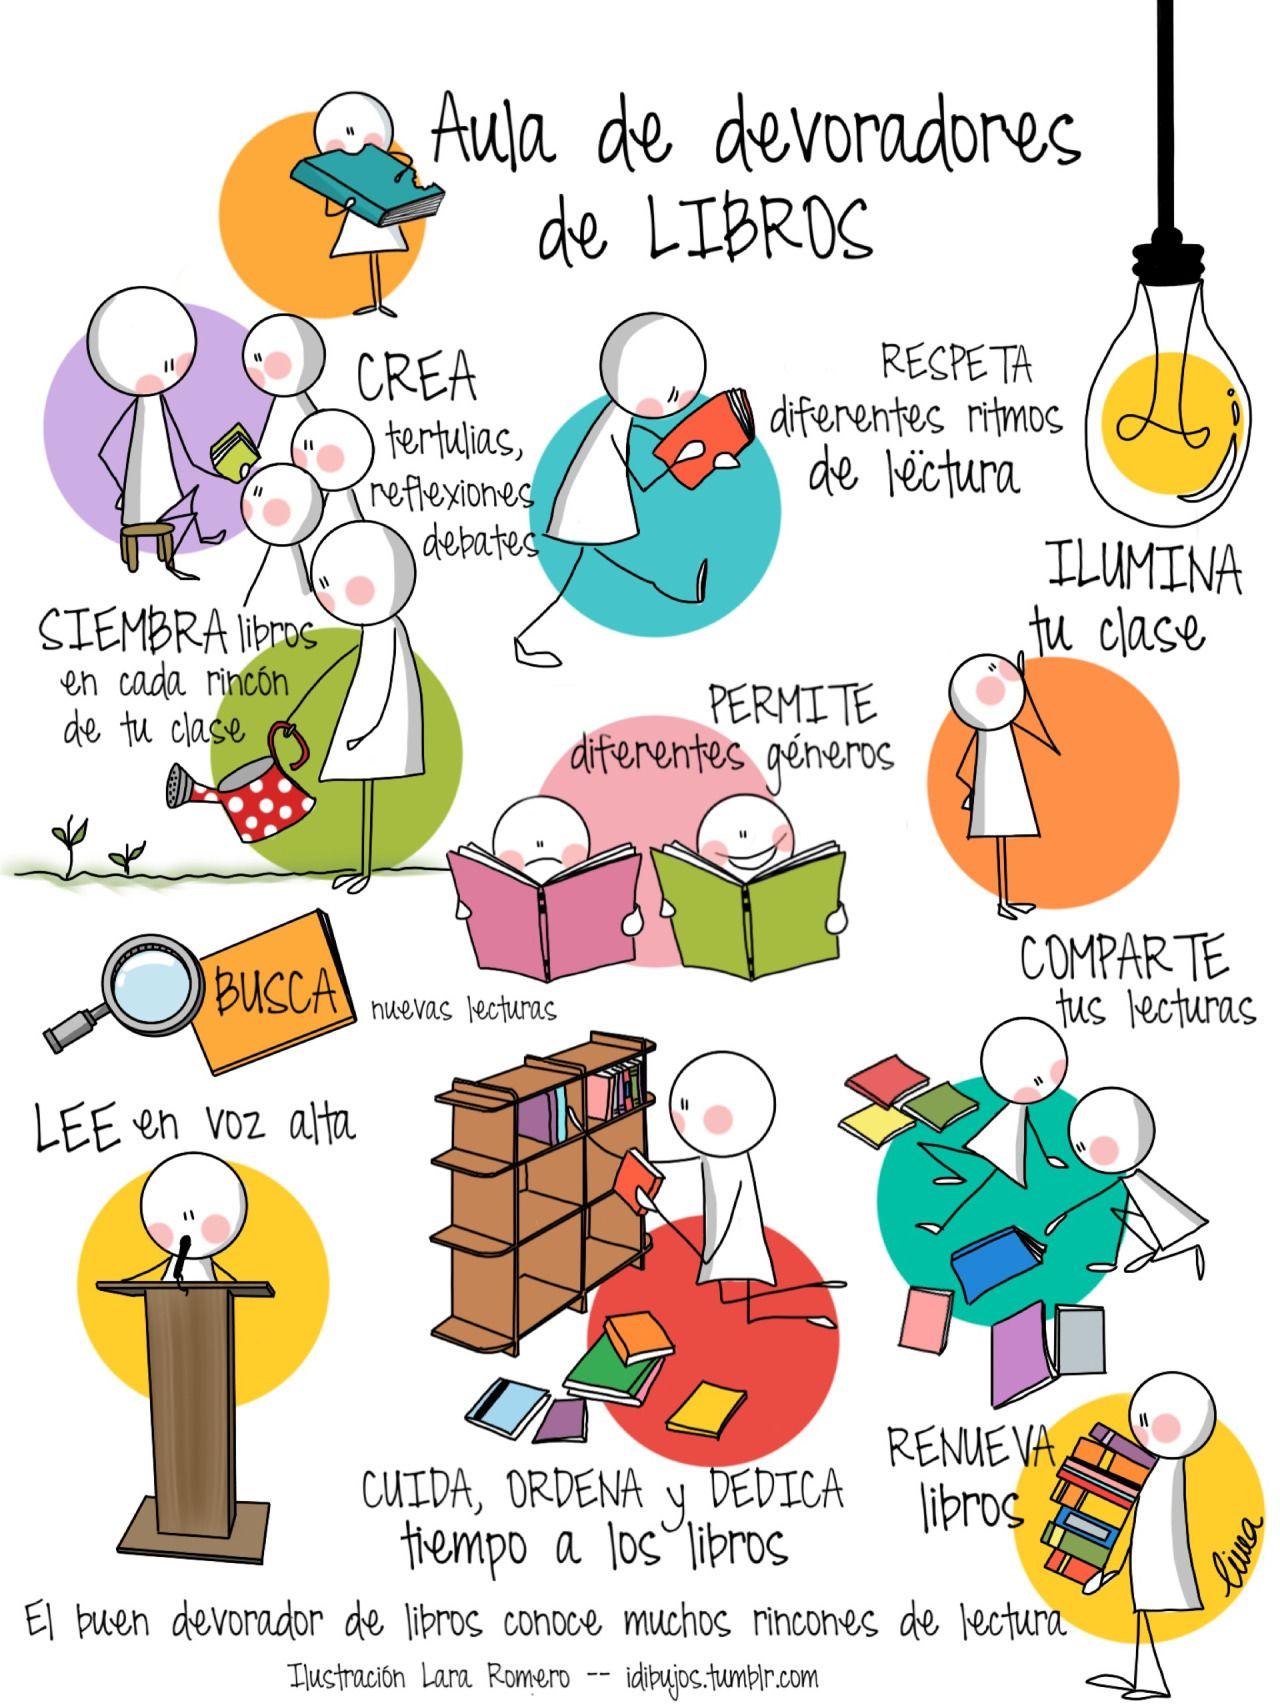 Learn to Speak Spanish Overnight - Link Translation